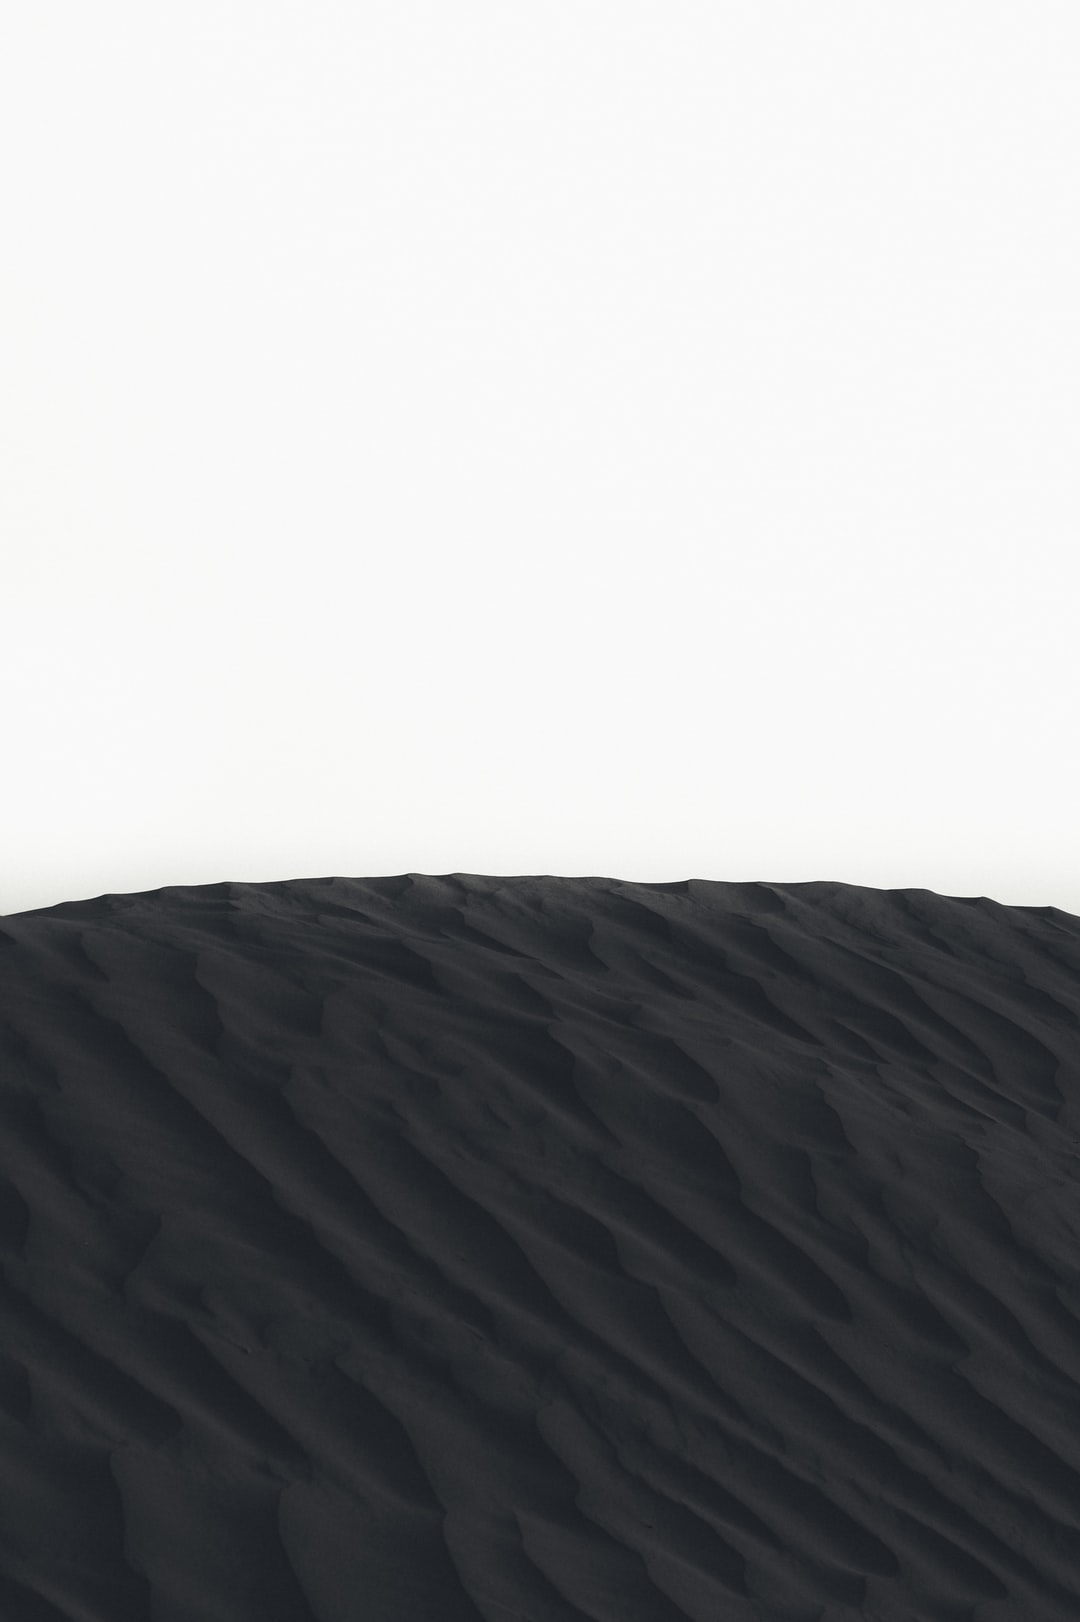 Minimalista, fekete-fehér